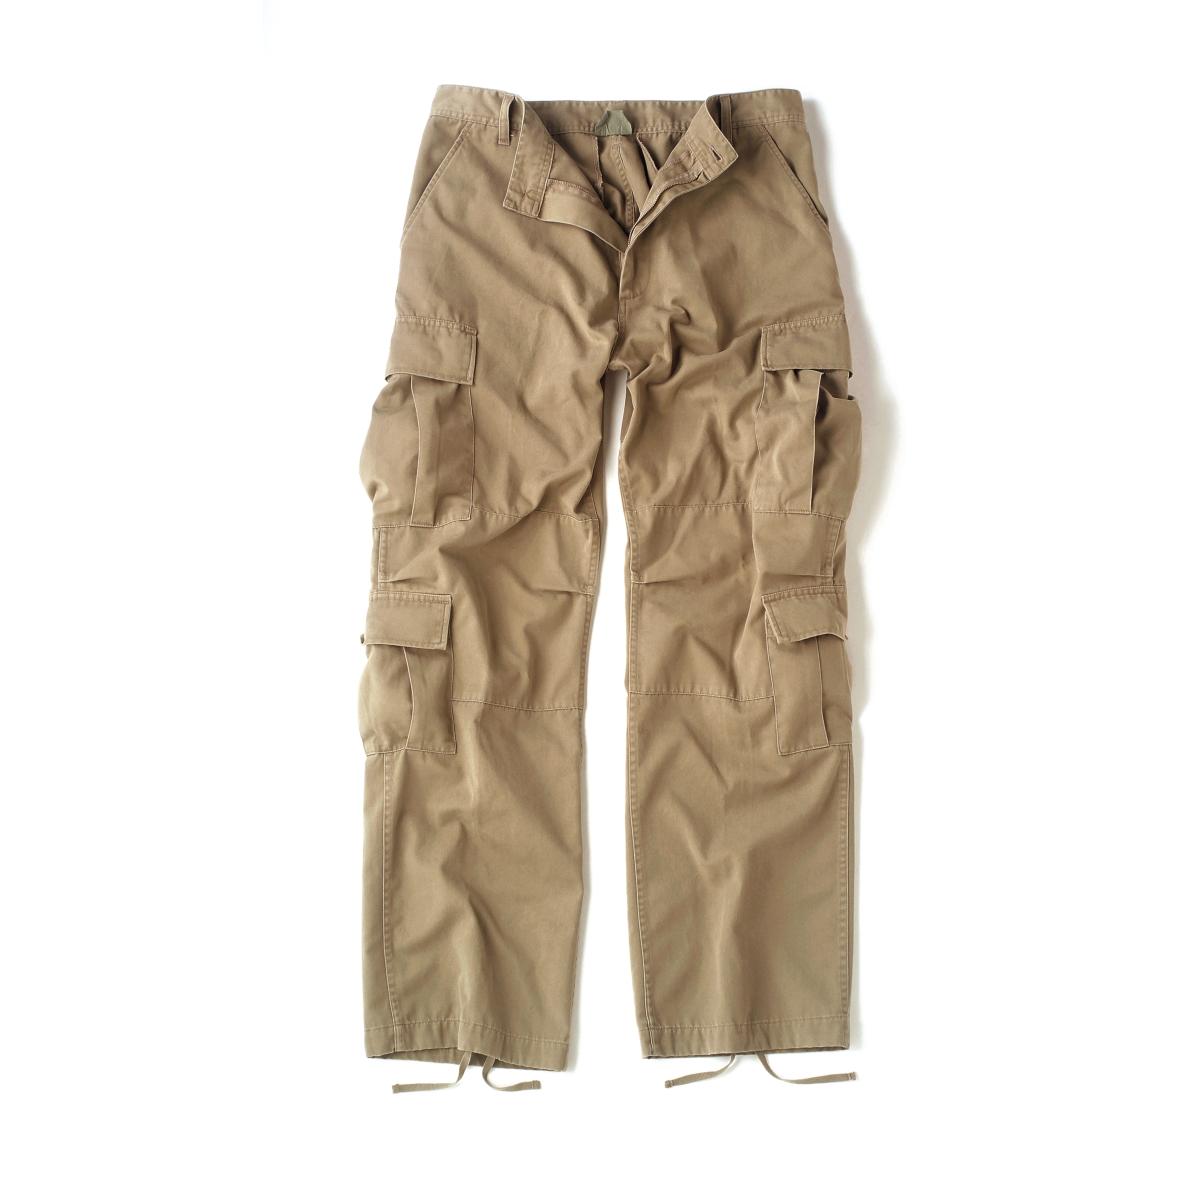 Men's Khaki Vintage Paratrooper Cargo Pants, New | eBay